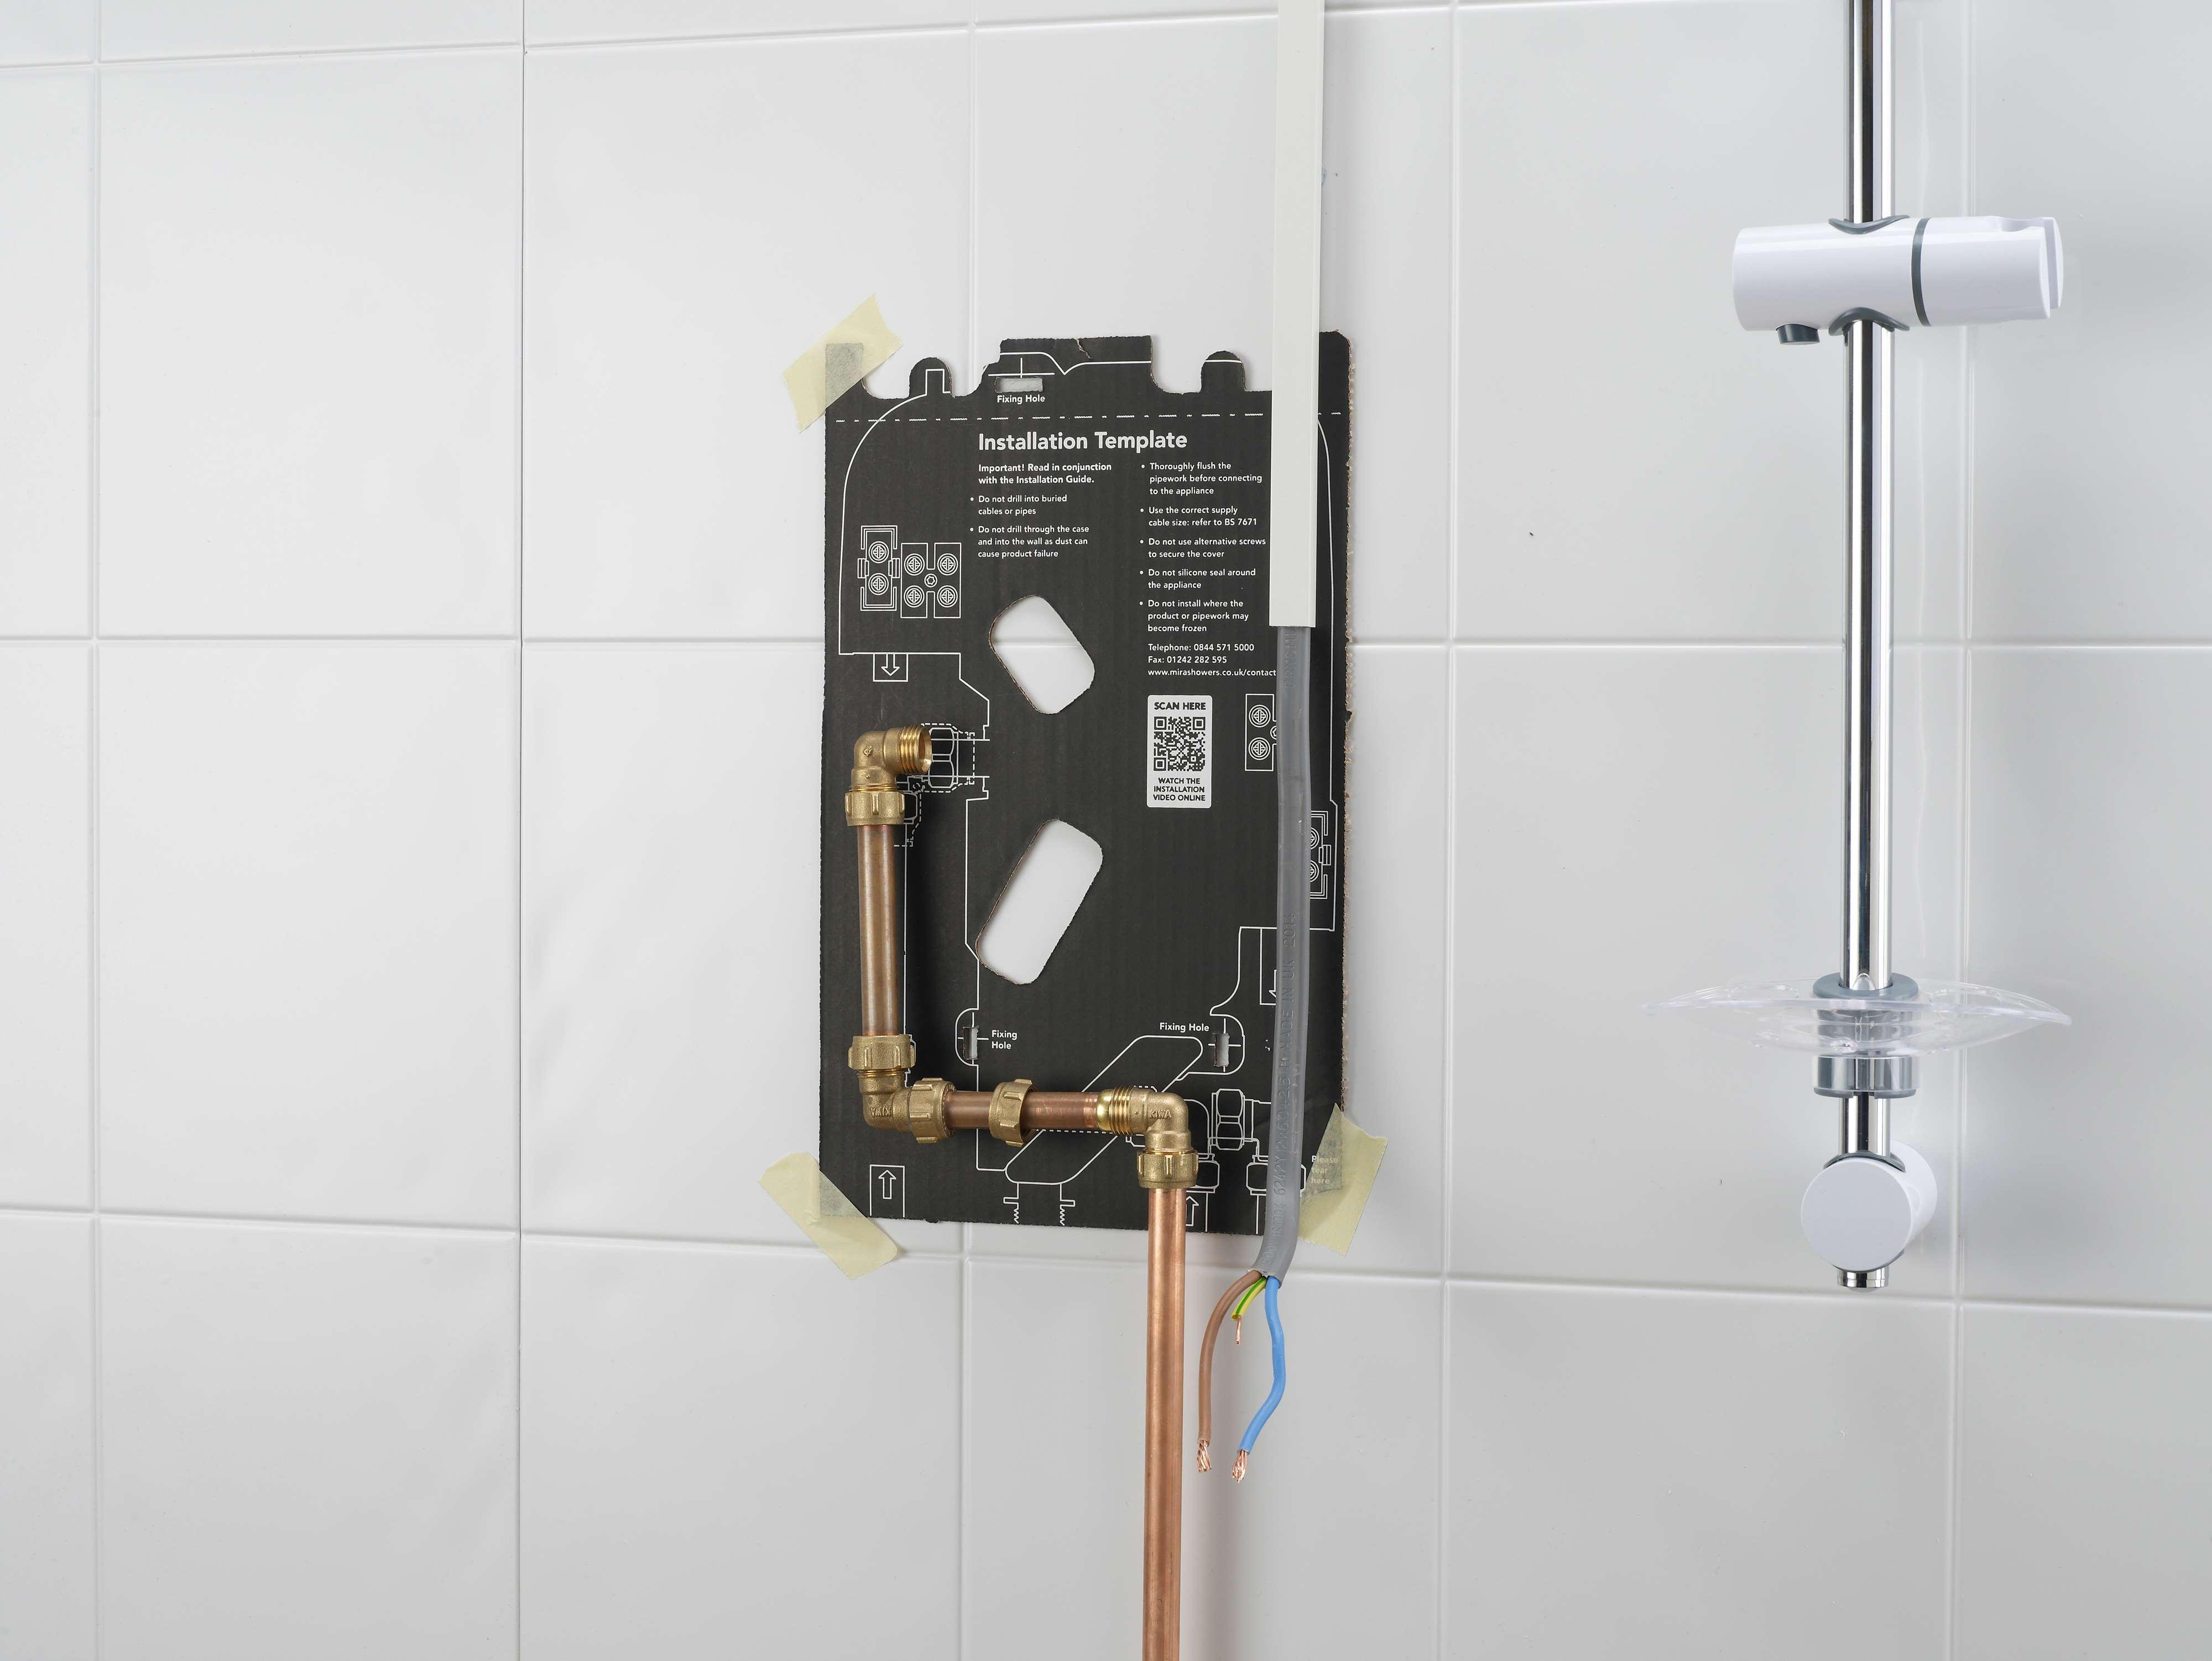 mira-jump-electric-shower-install-02.jpg